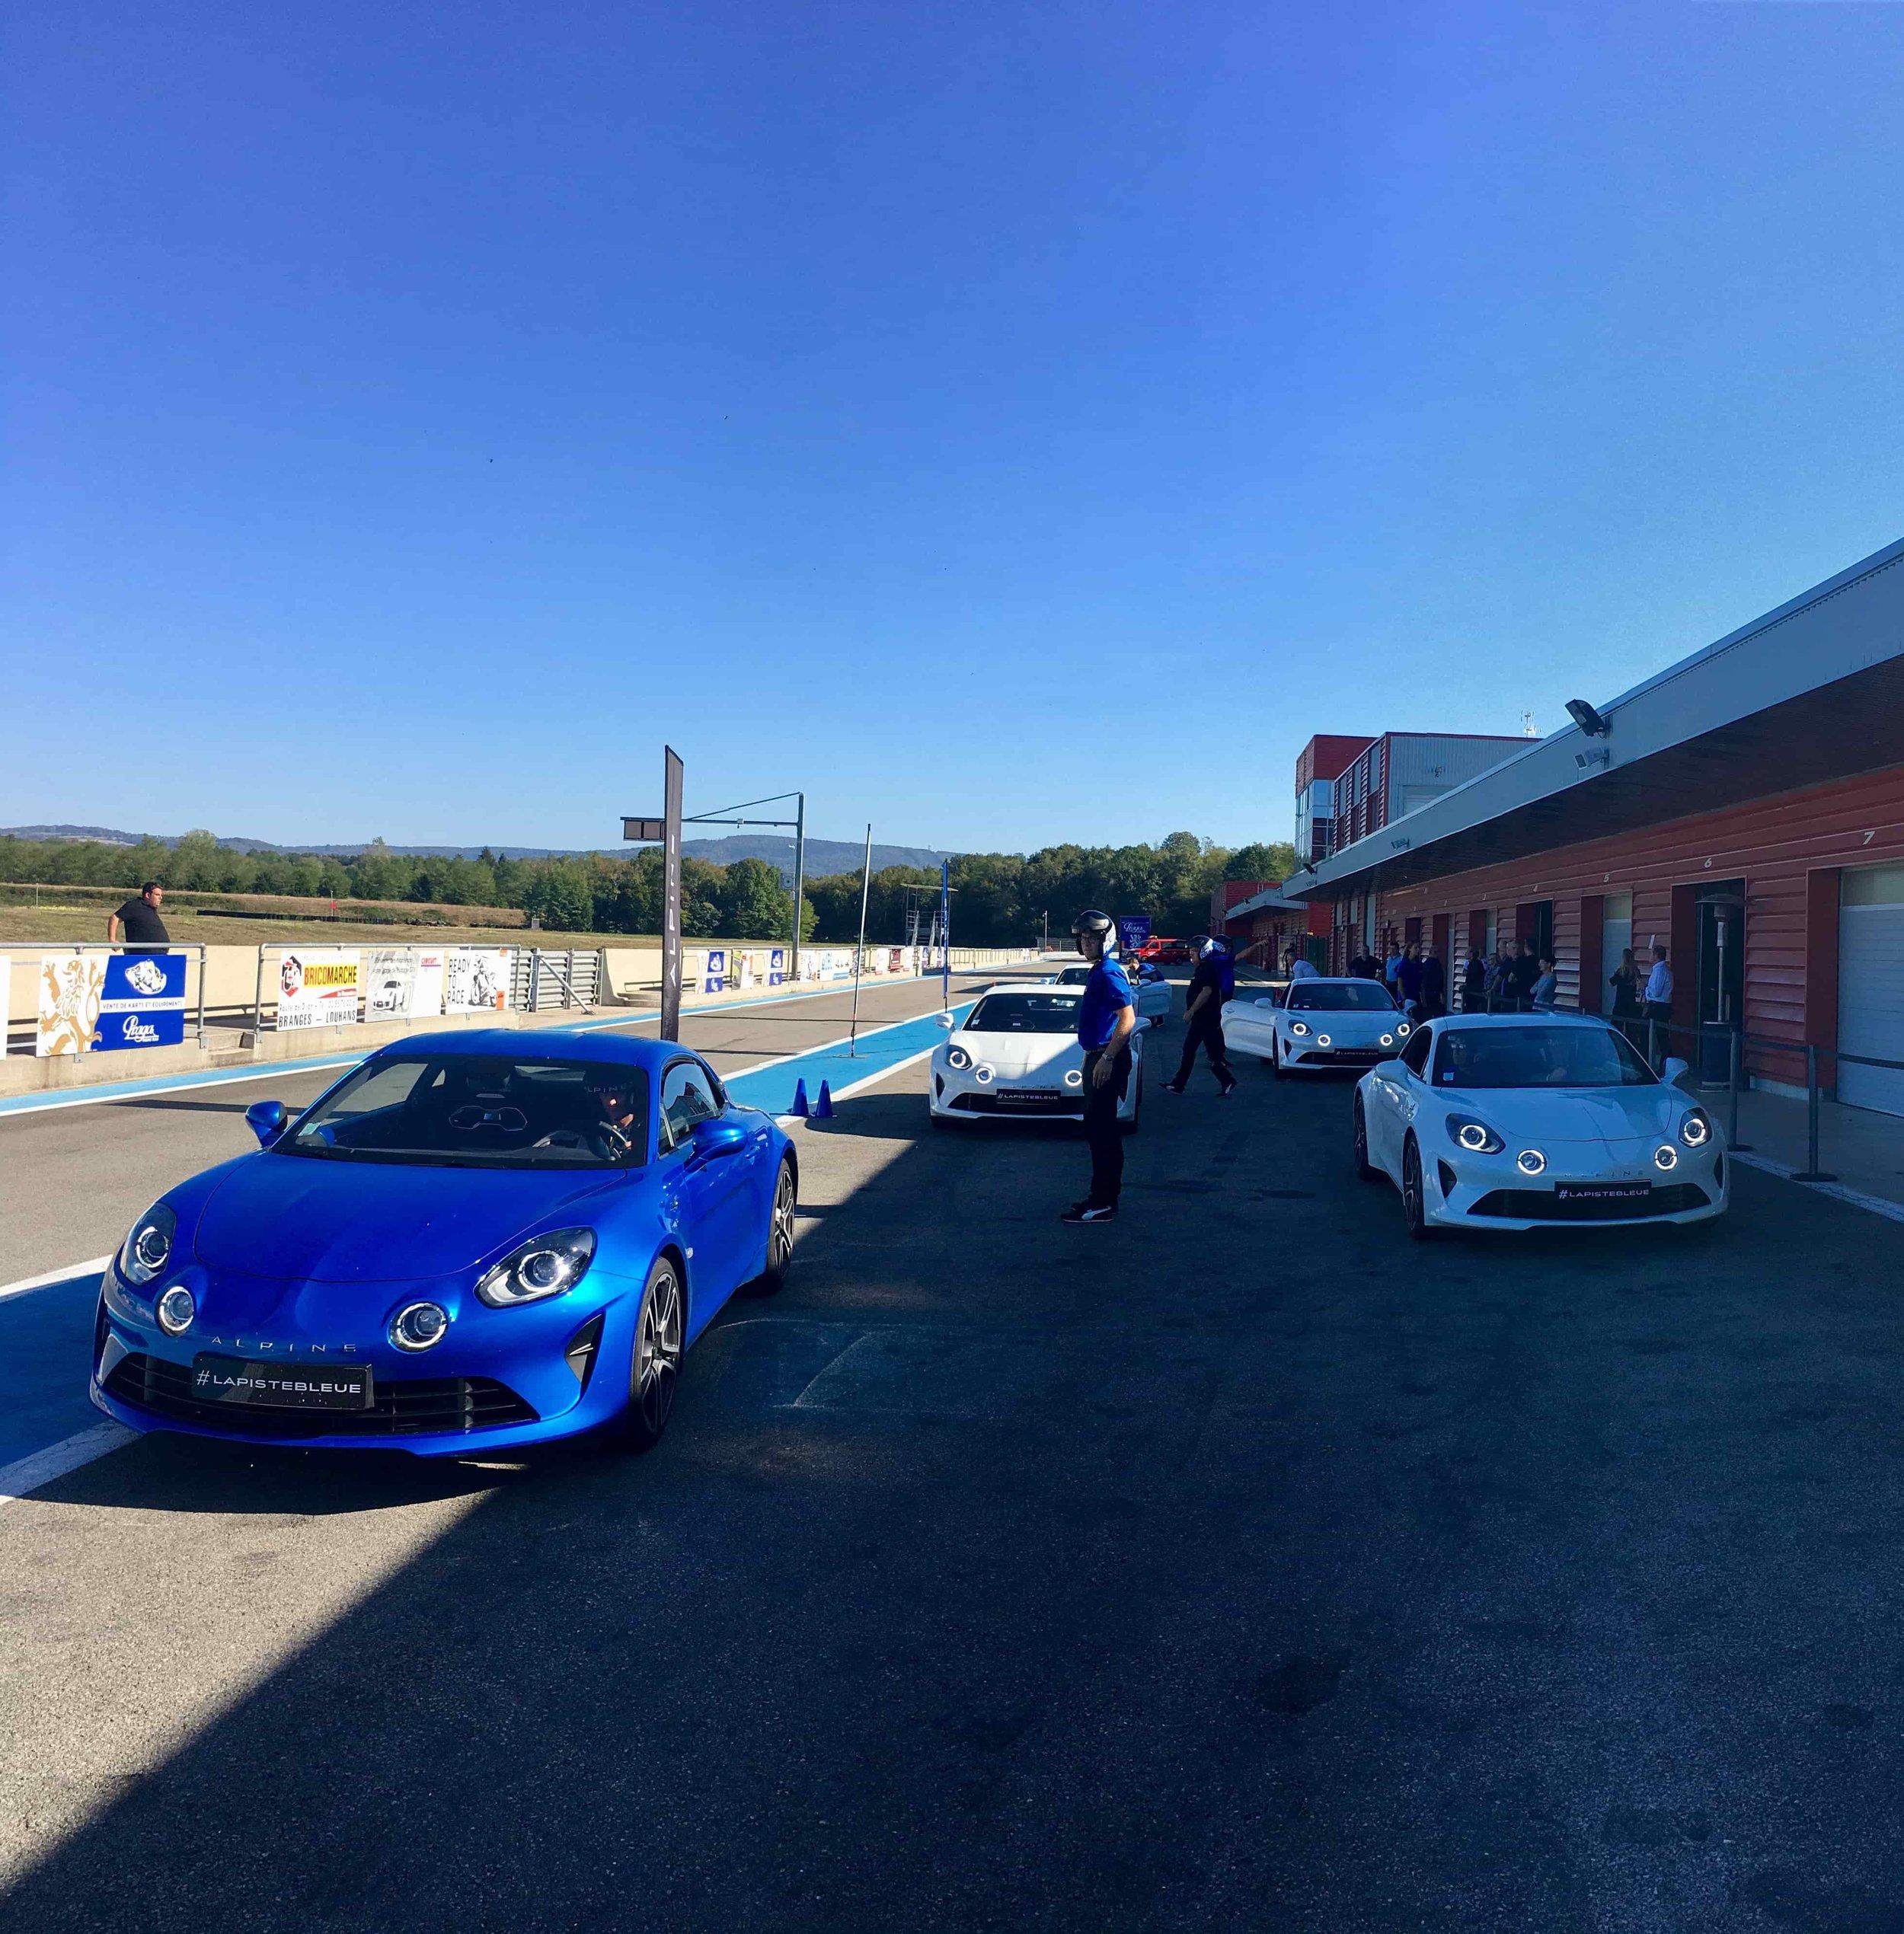 alpine_thegoodcar_circuit